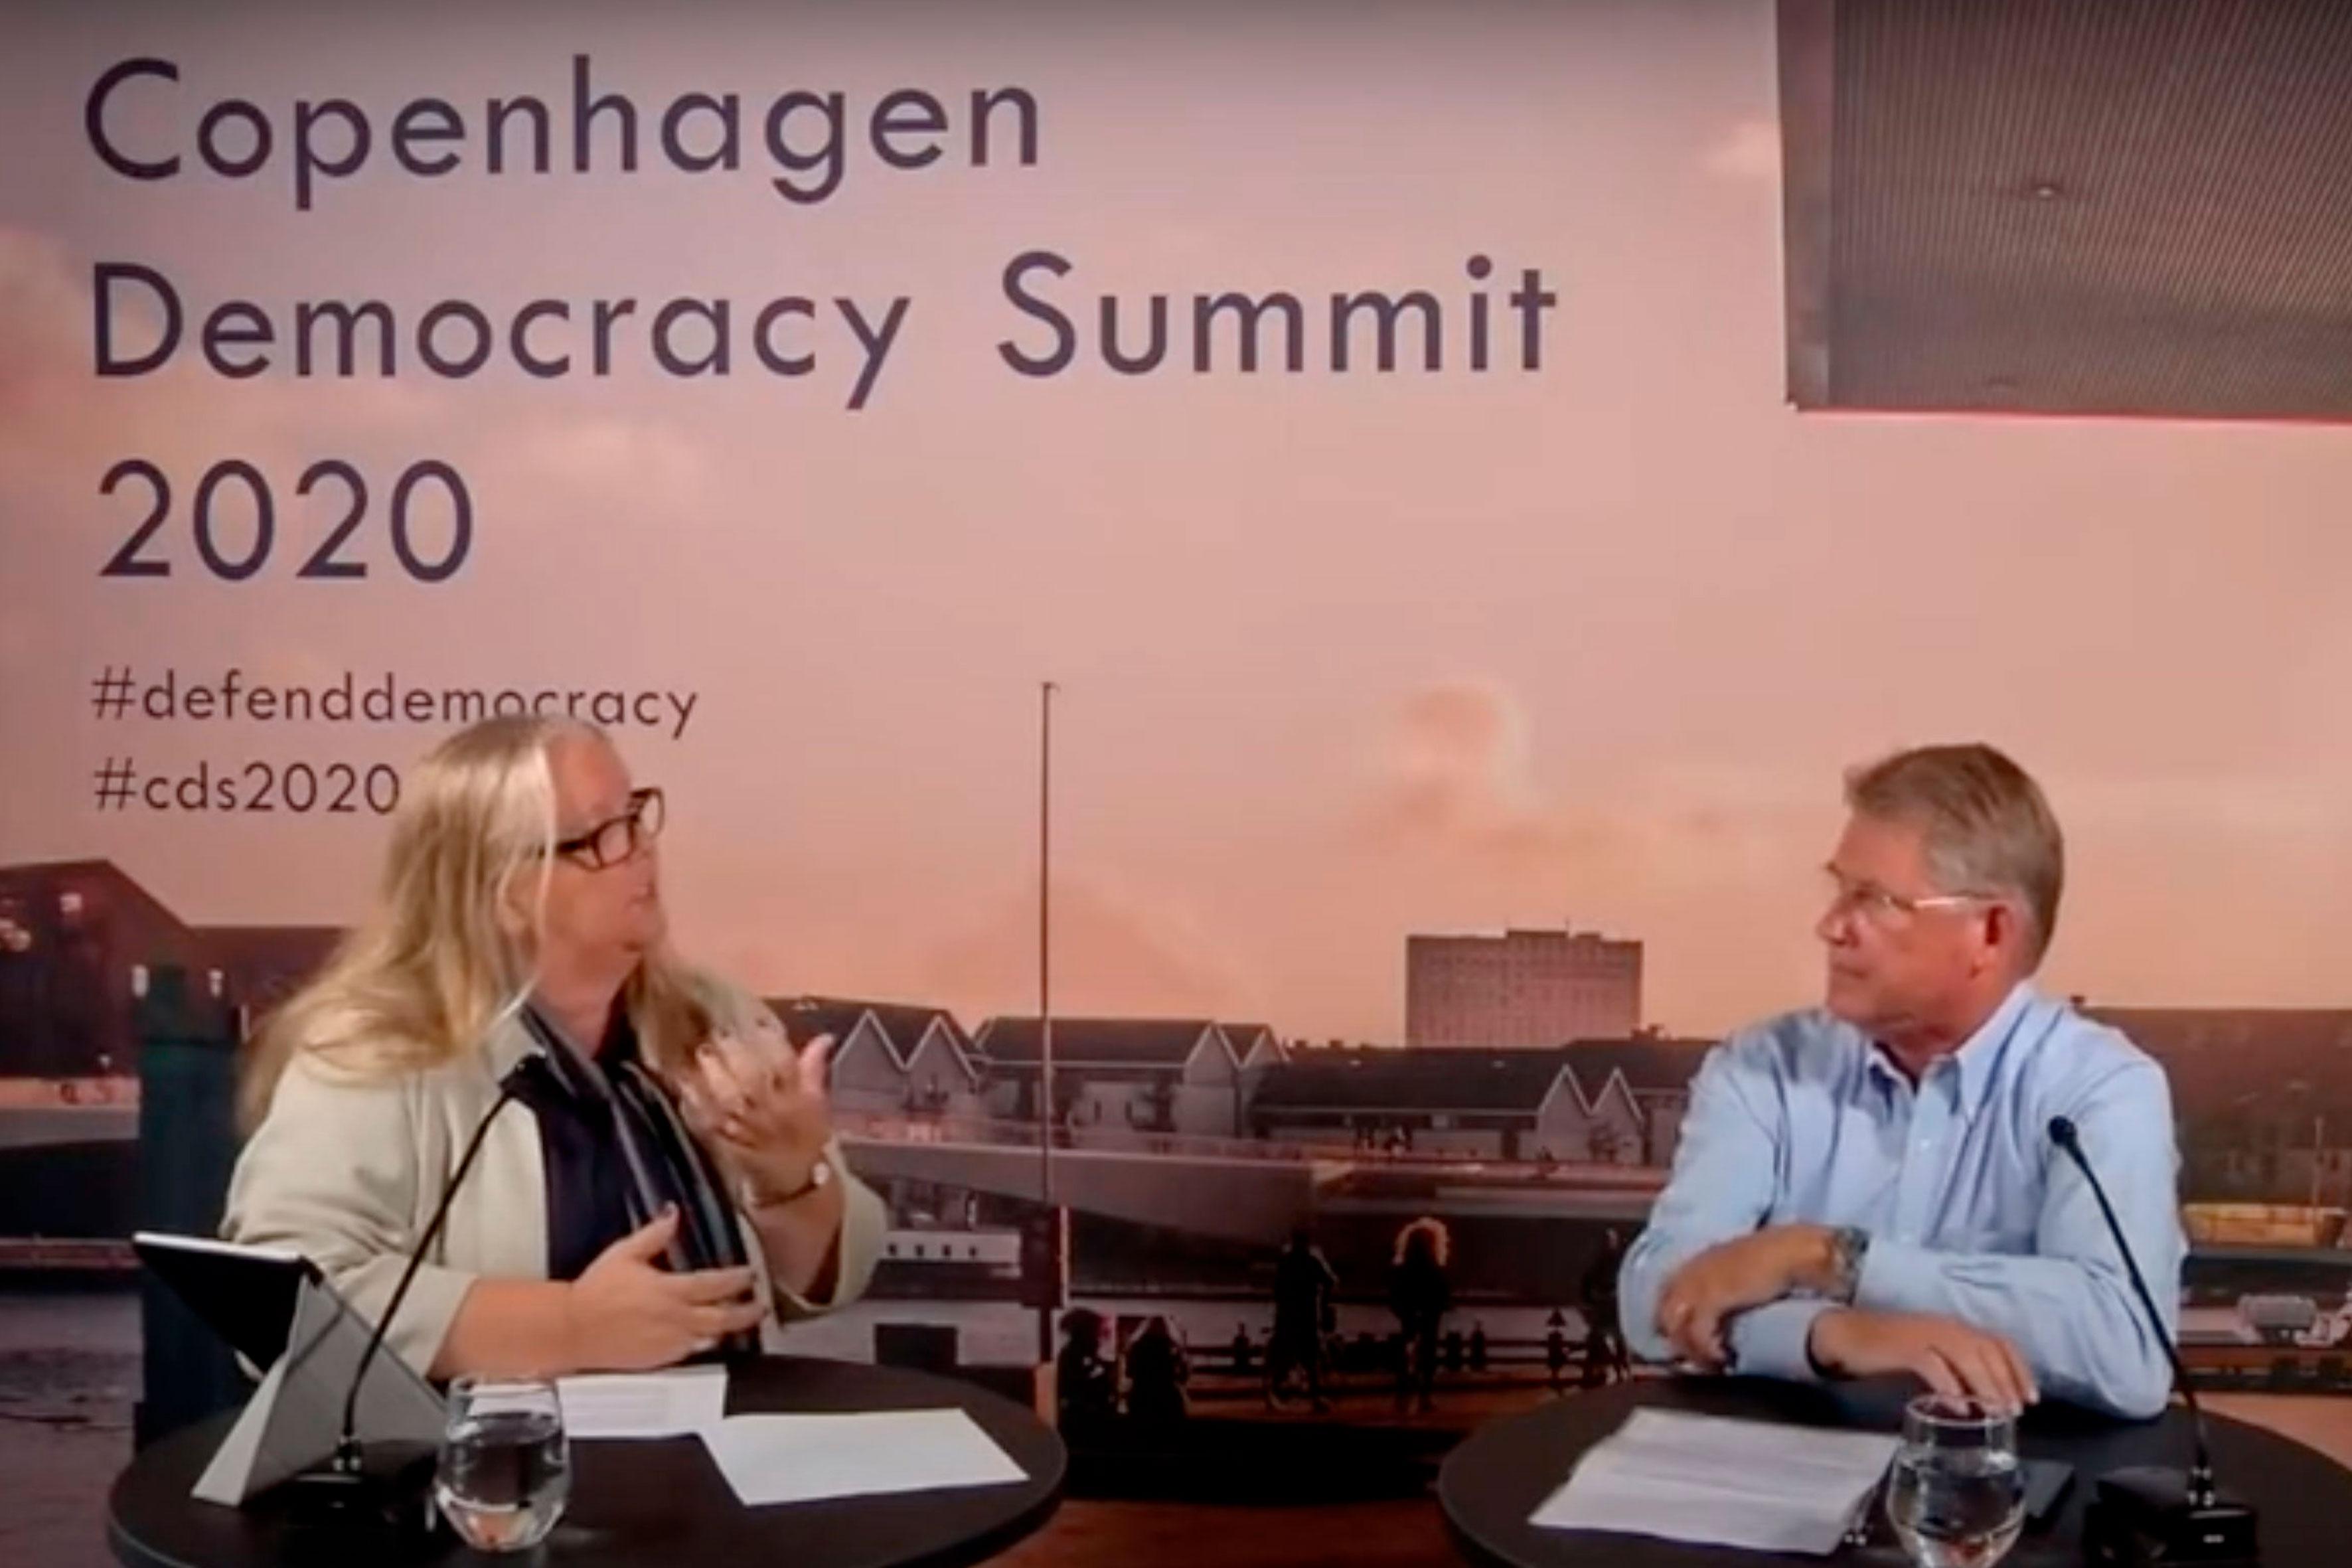 The Copenhagen Democracy Summit 2020